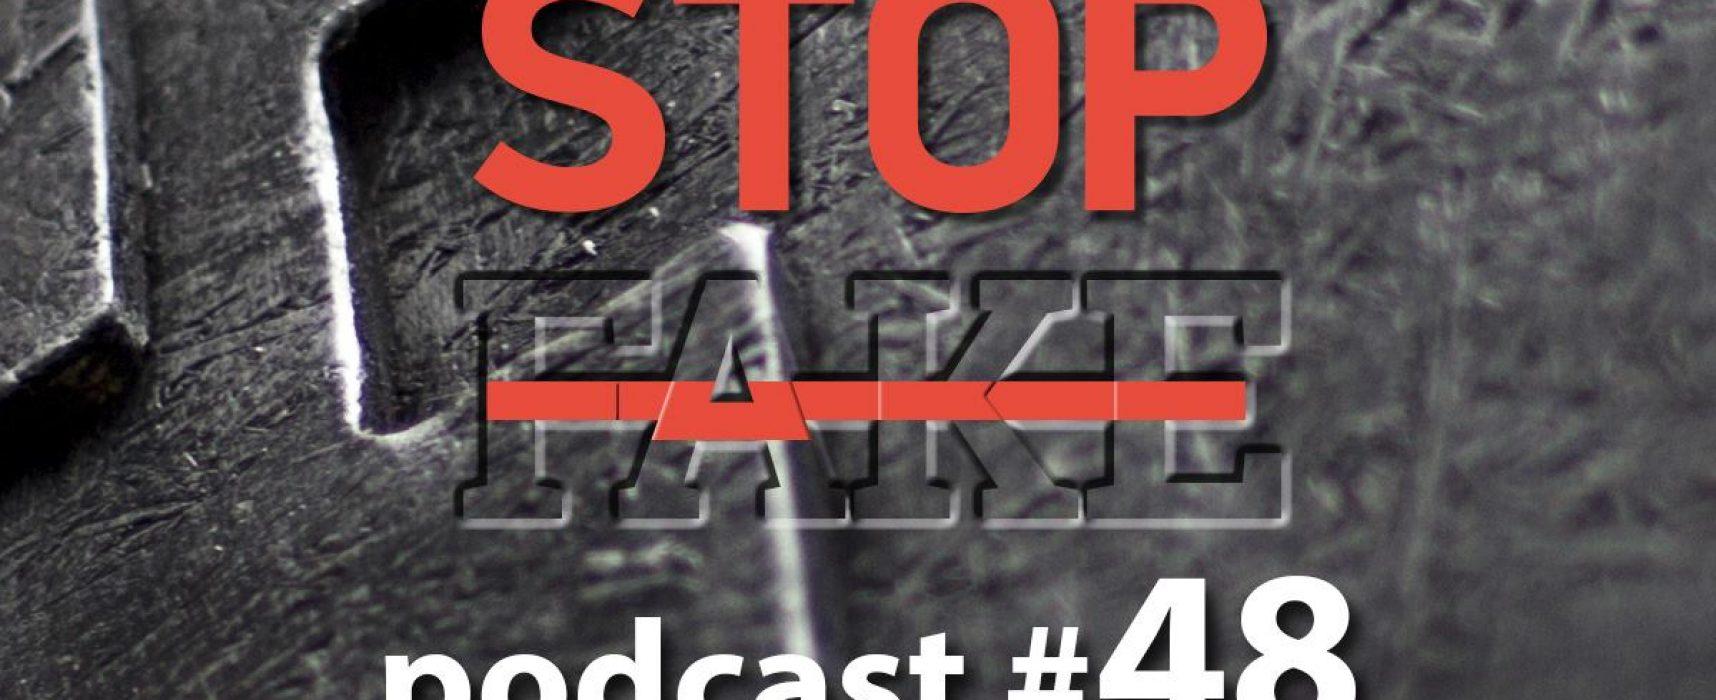 StopFake podcast #48